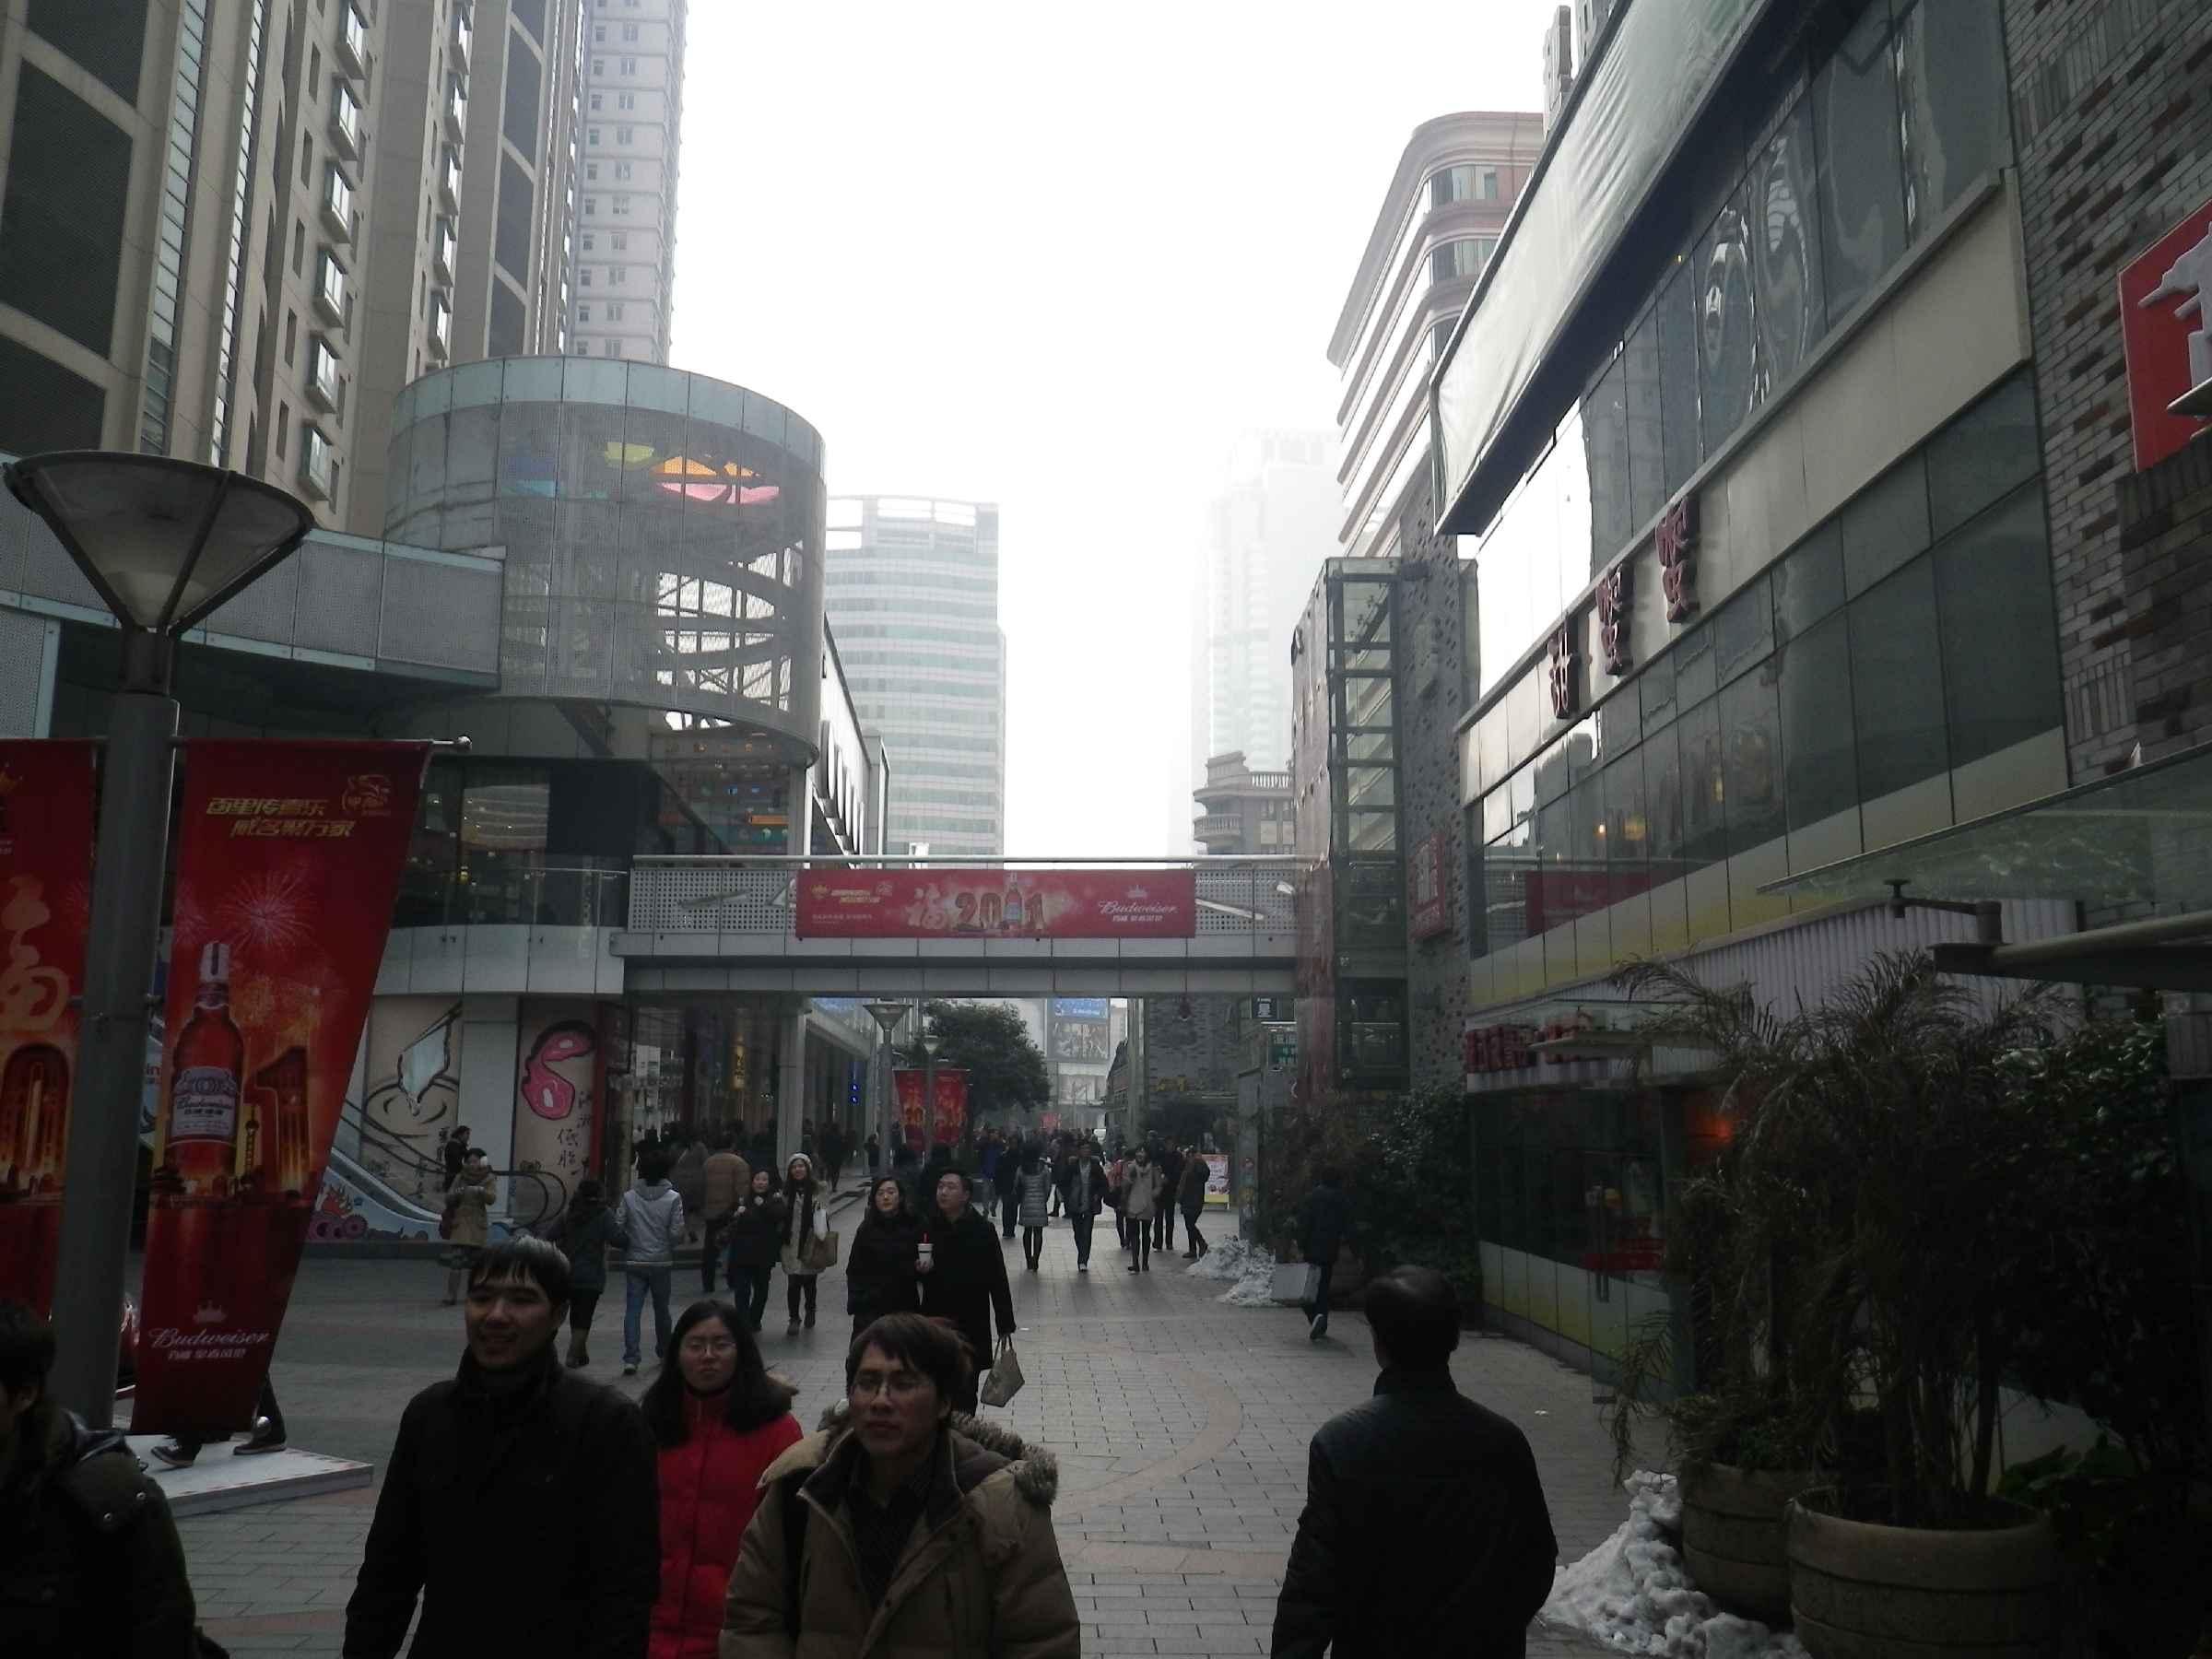 Şanghay\'da Alternatif Fast Food (Carl\'s Jr.)